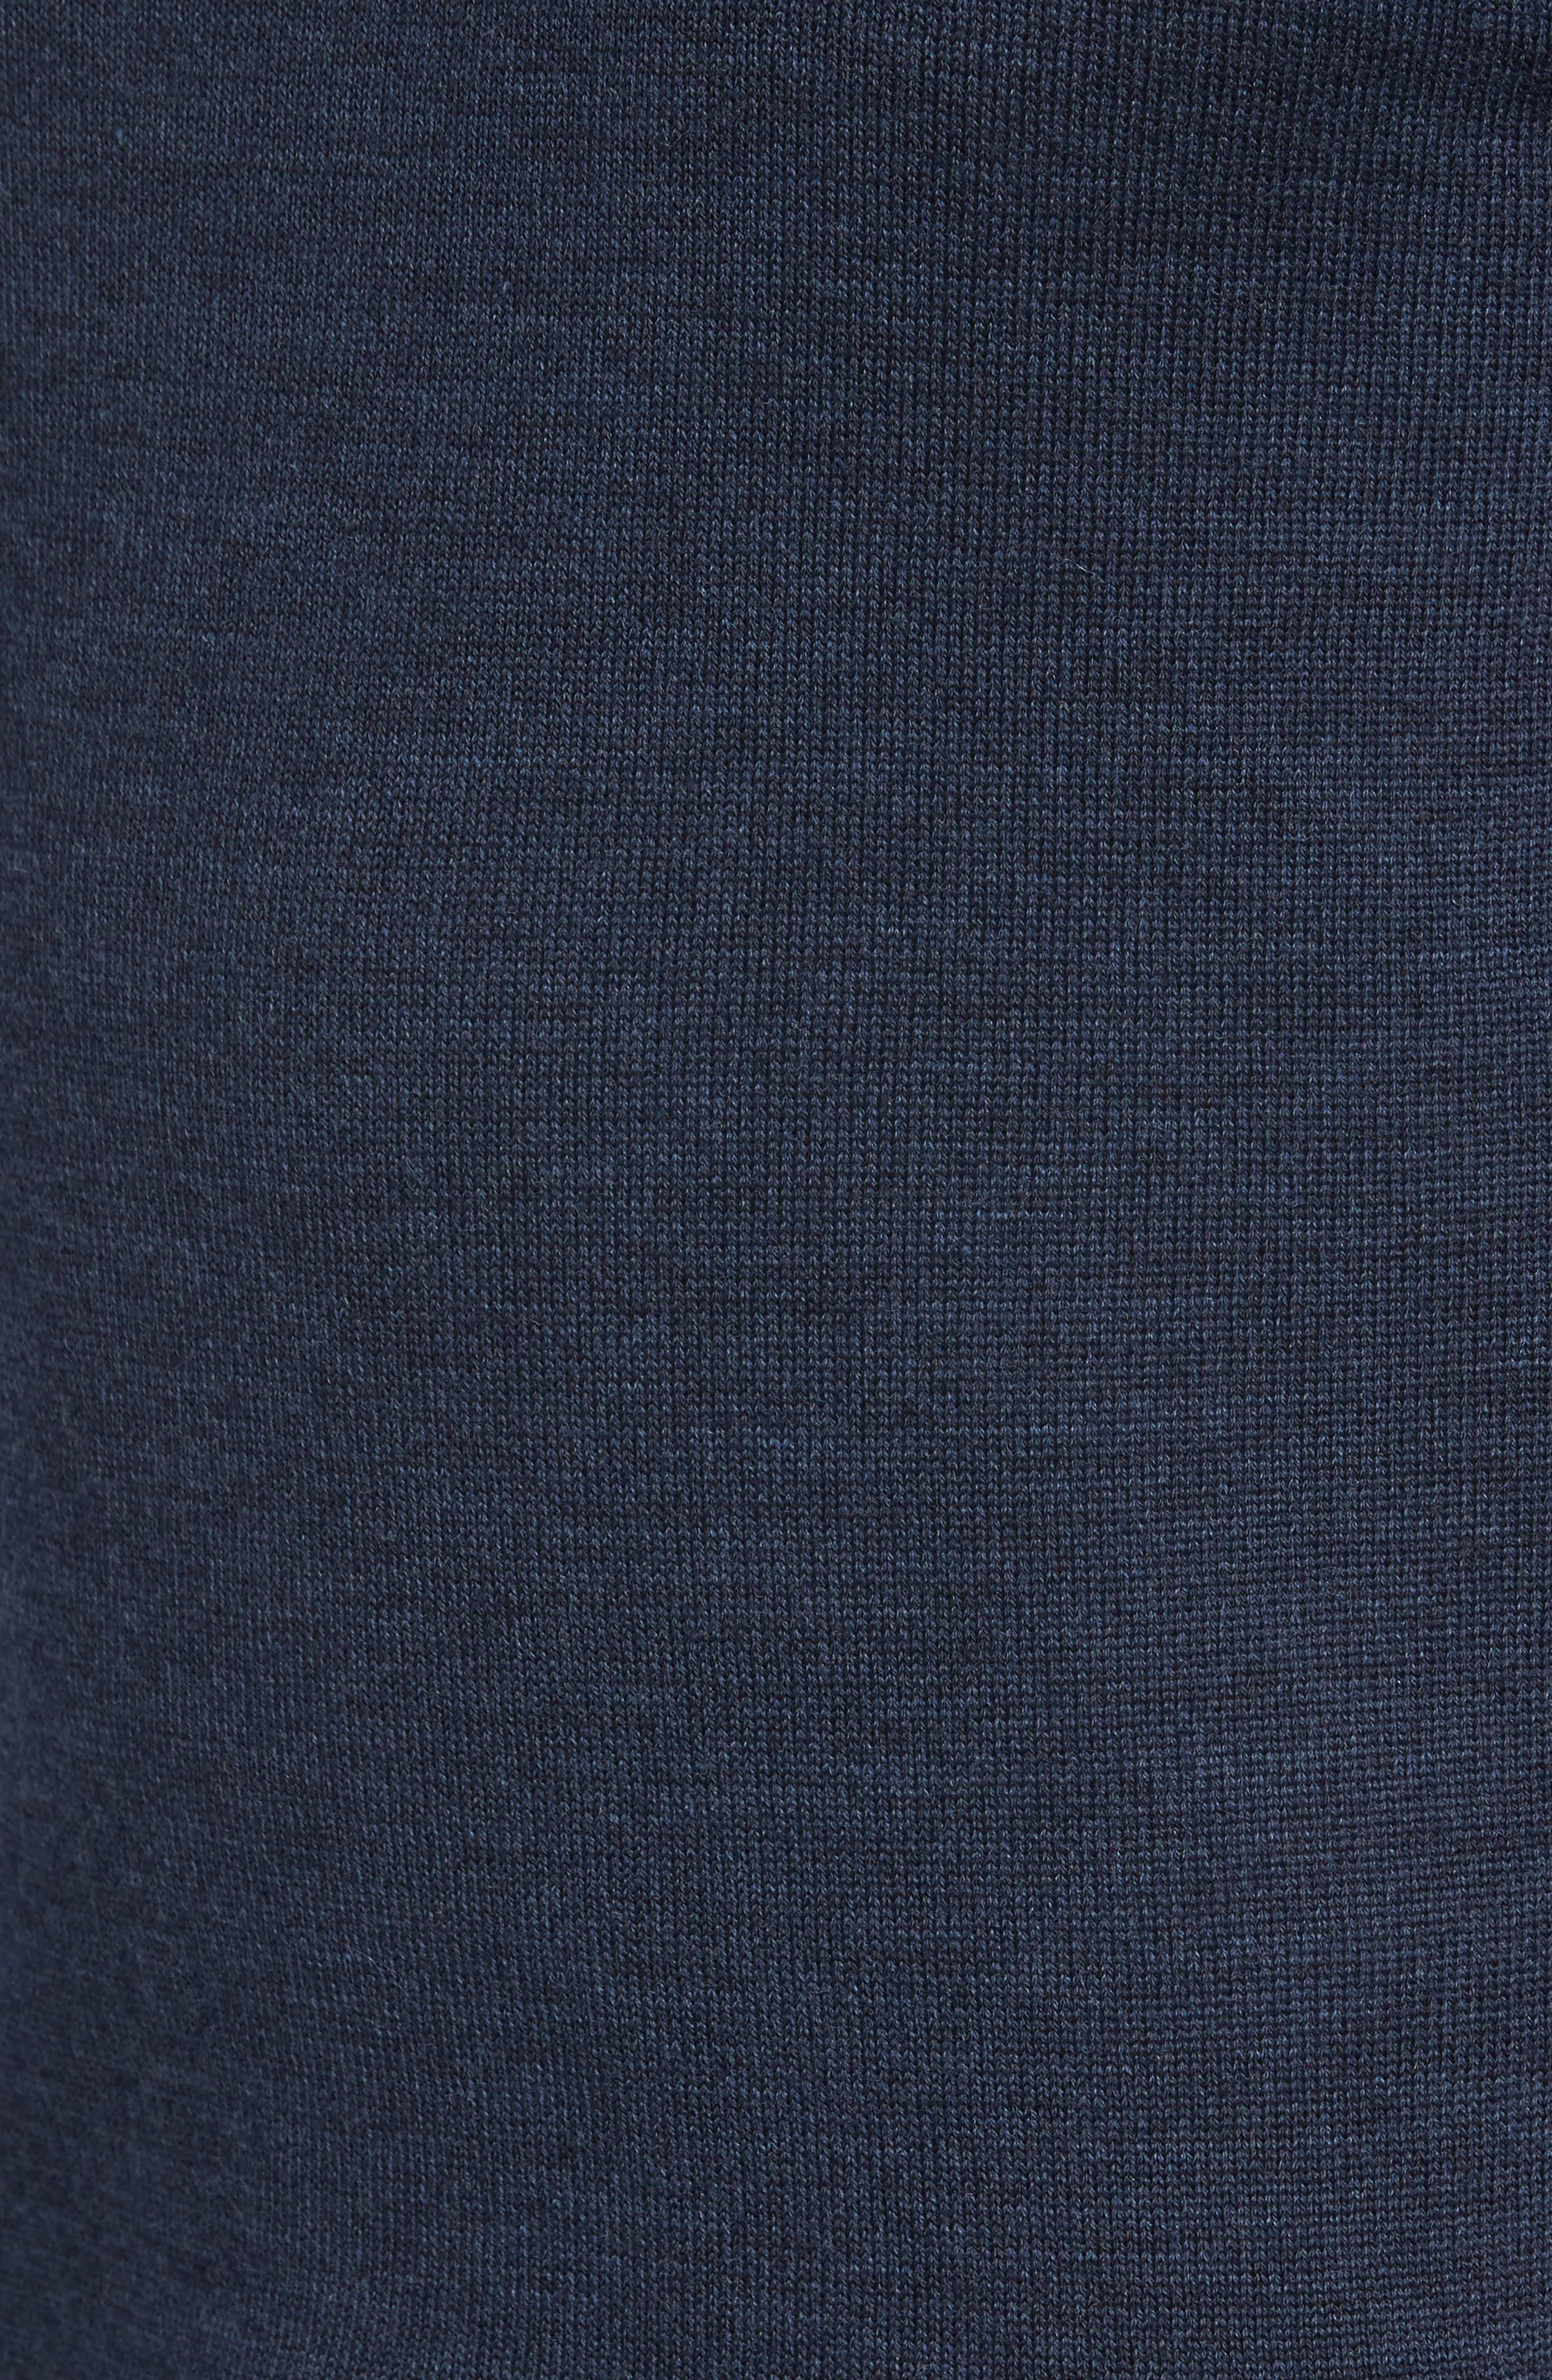 Bannockburn Mélange Merino Wool Sweater,                             Alternate thumbnail 5, color,                             Ink